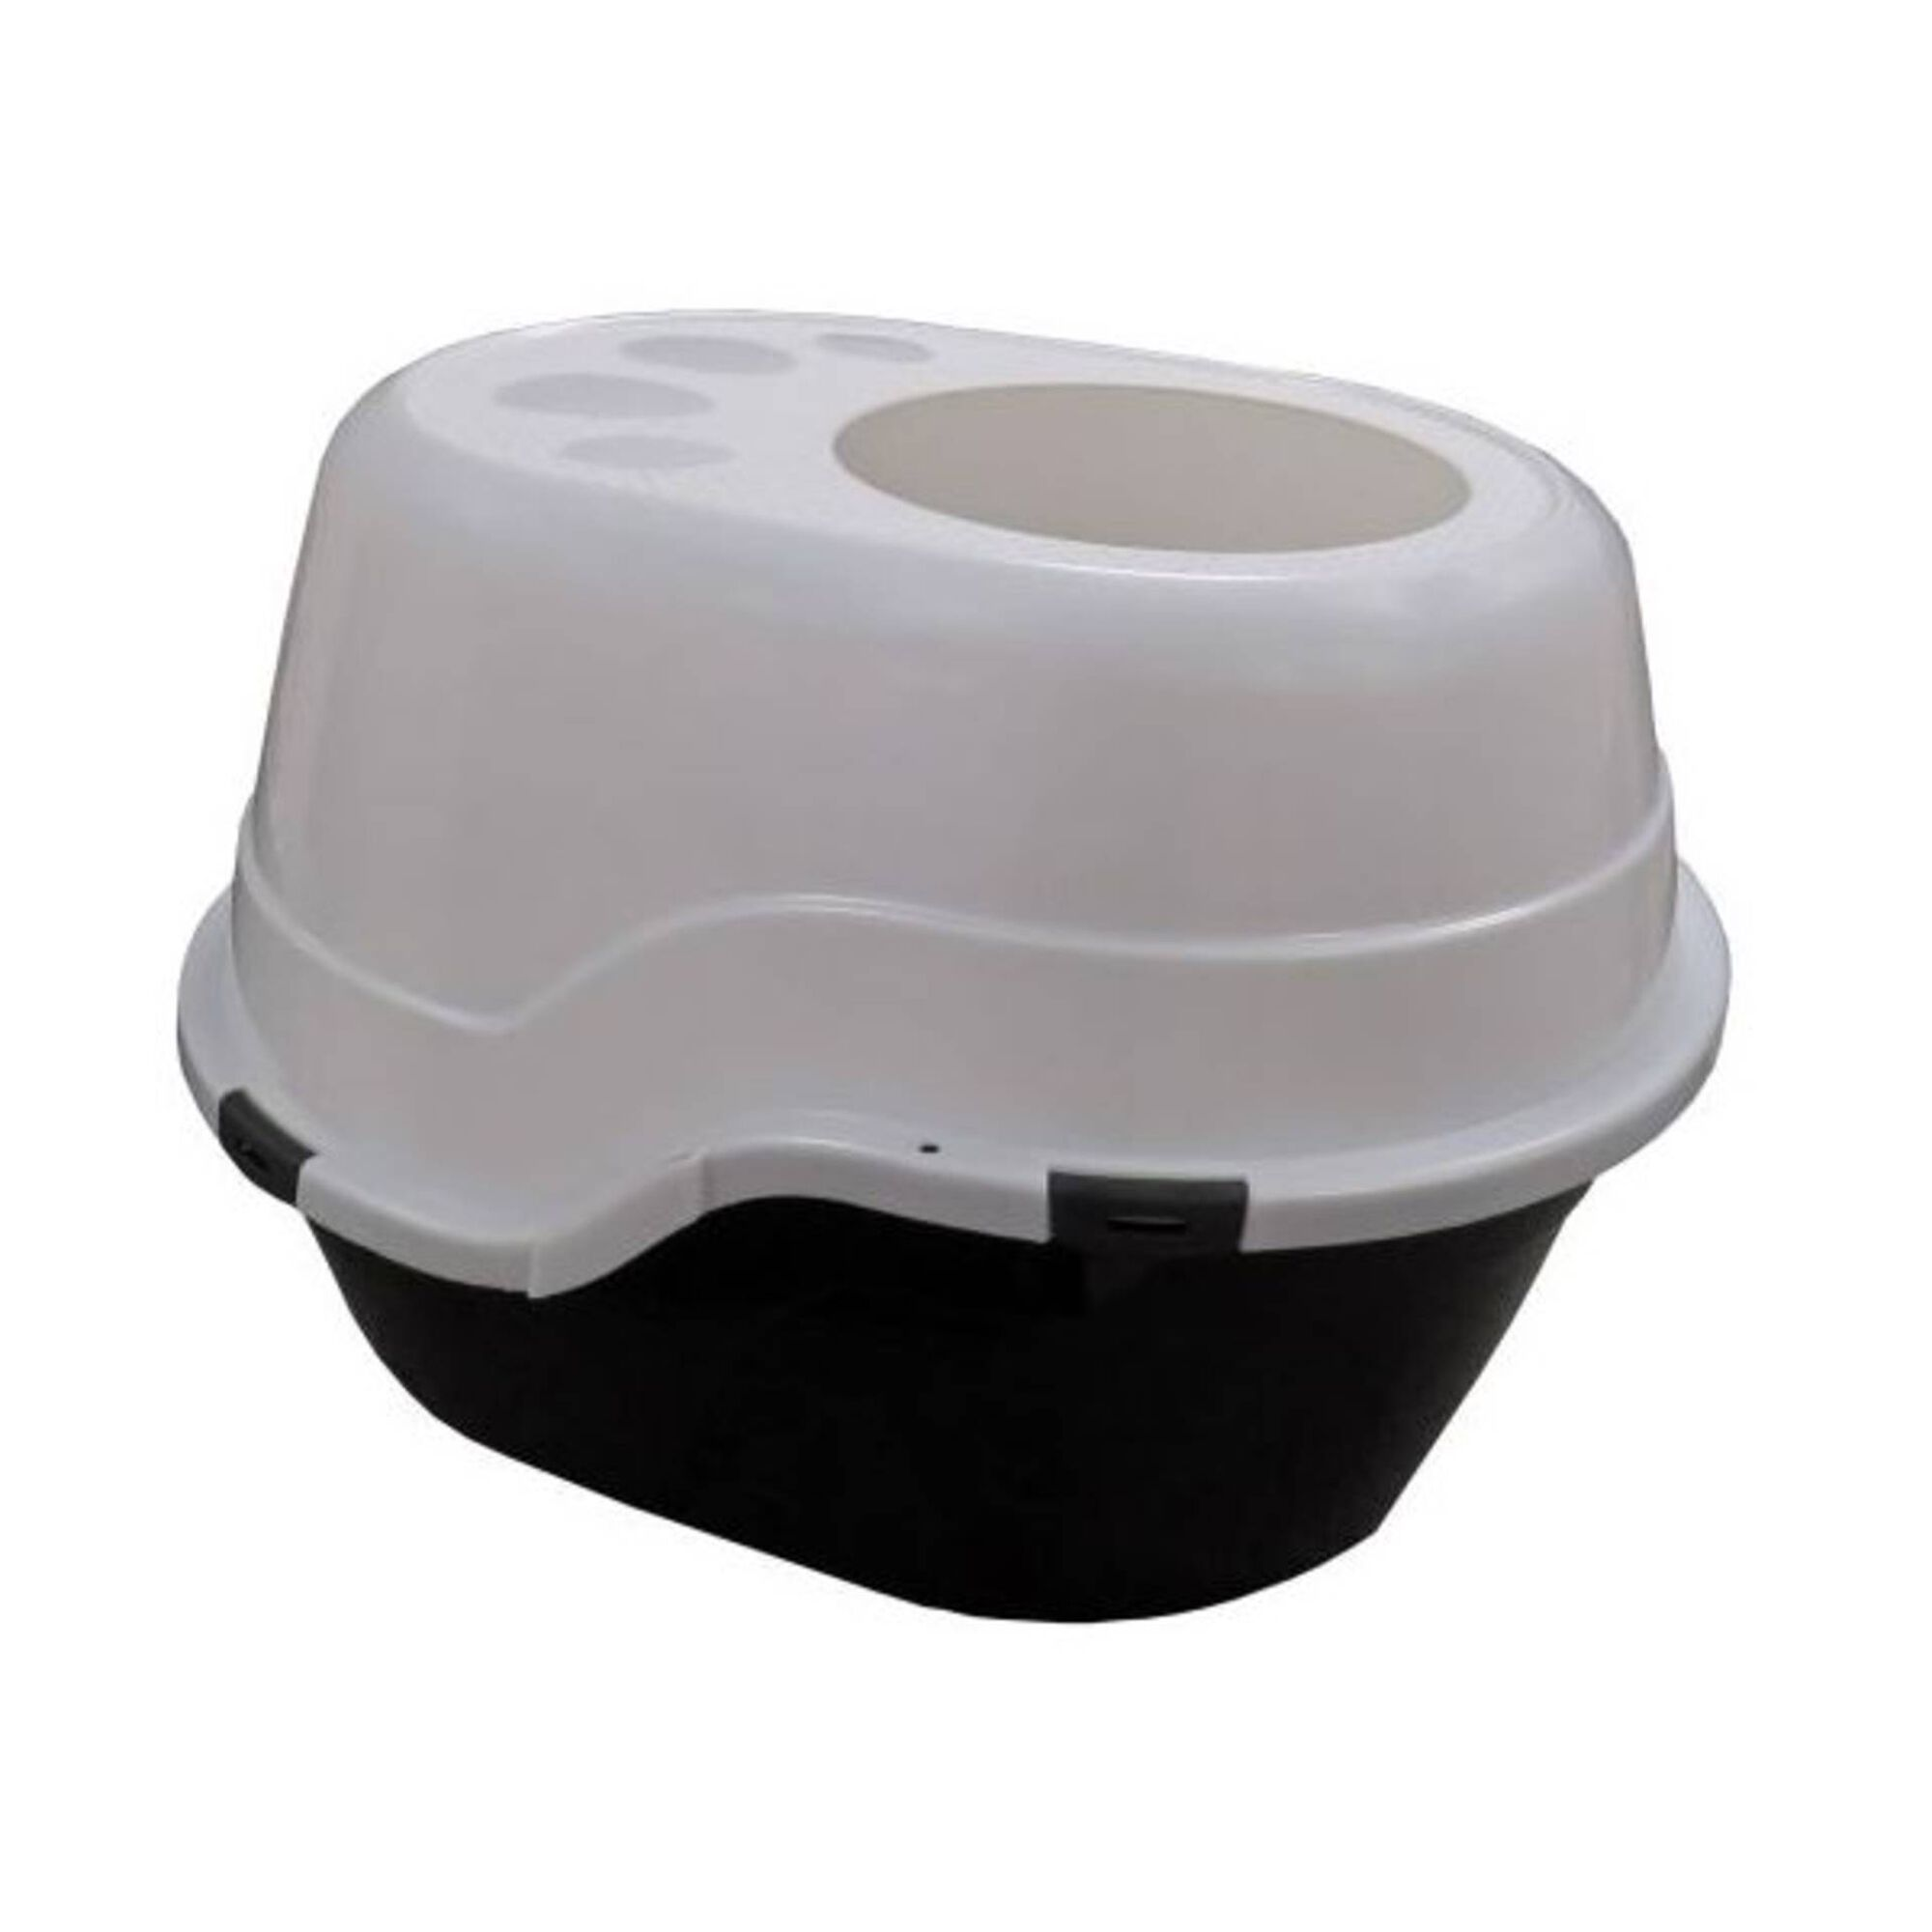 WC para Gato com Abertura Preto/Branco